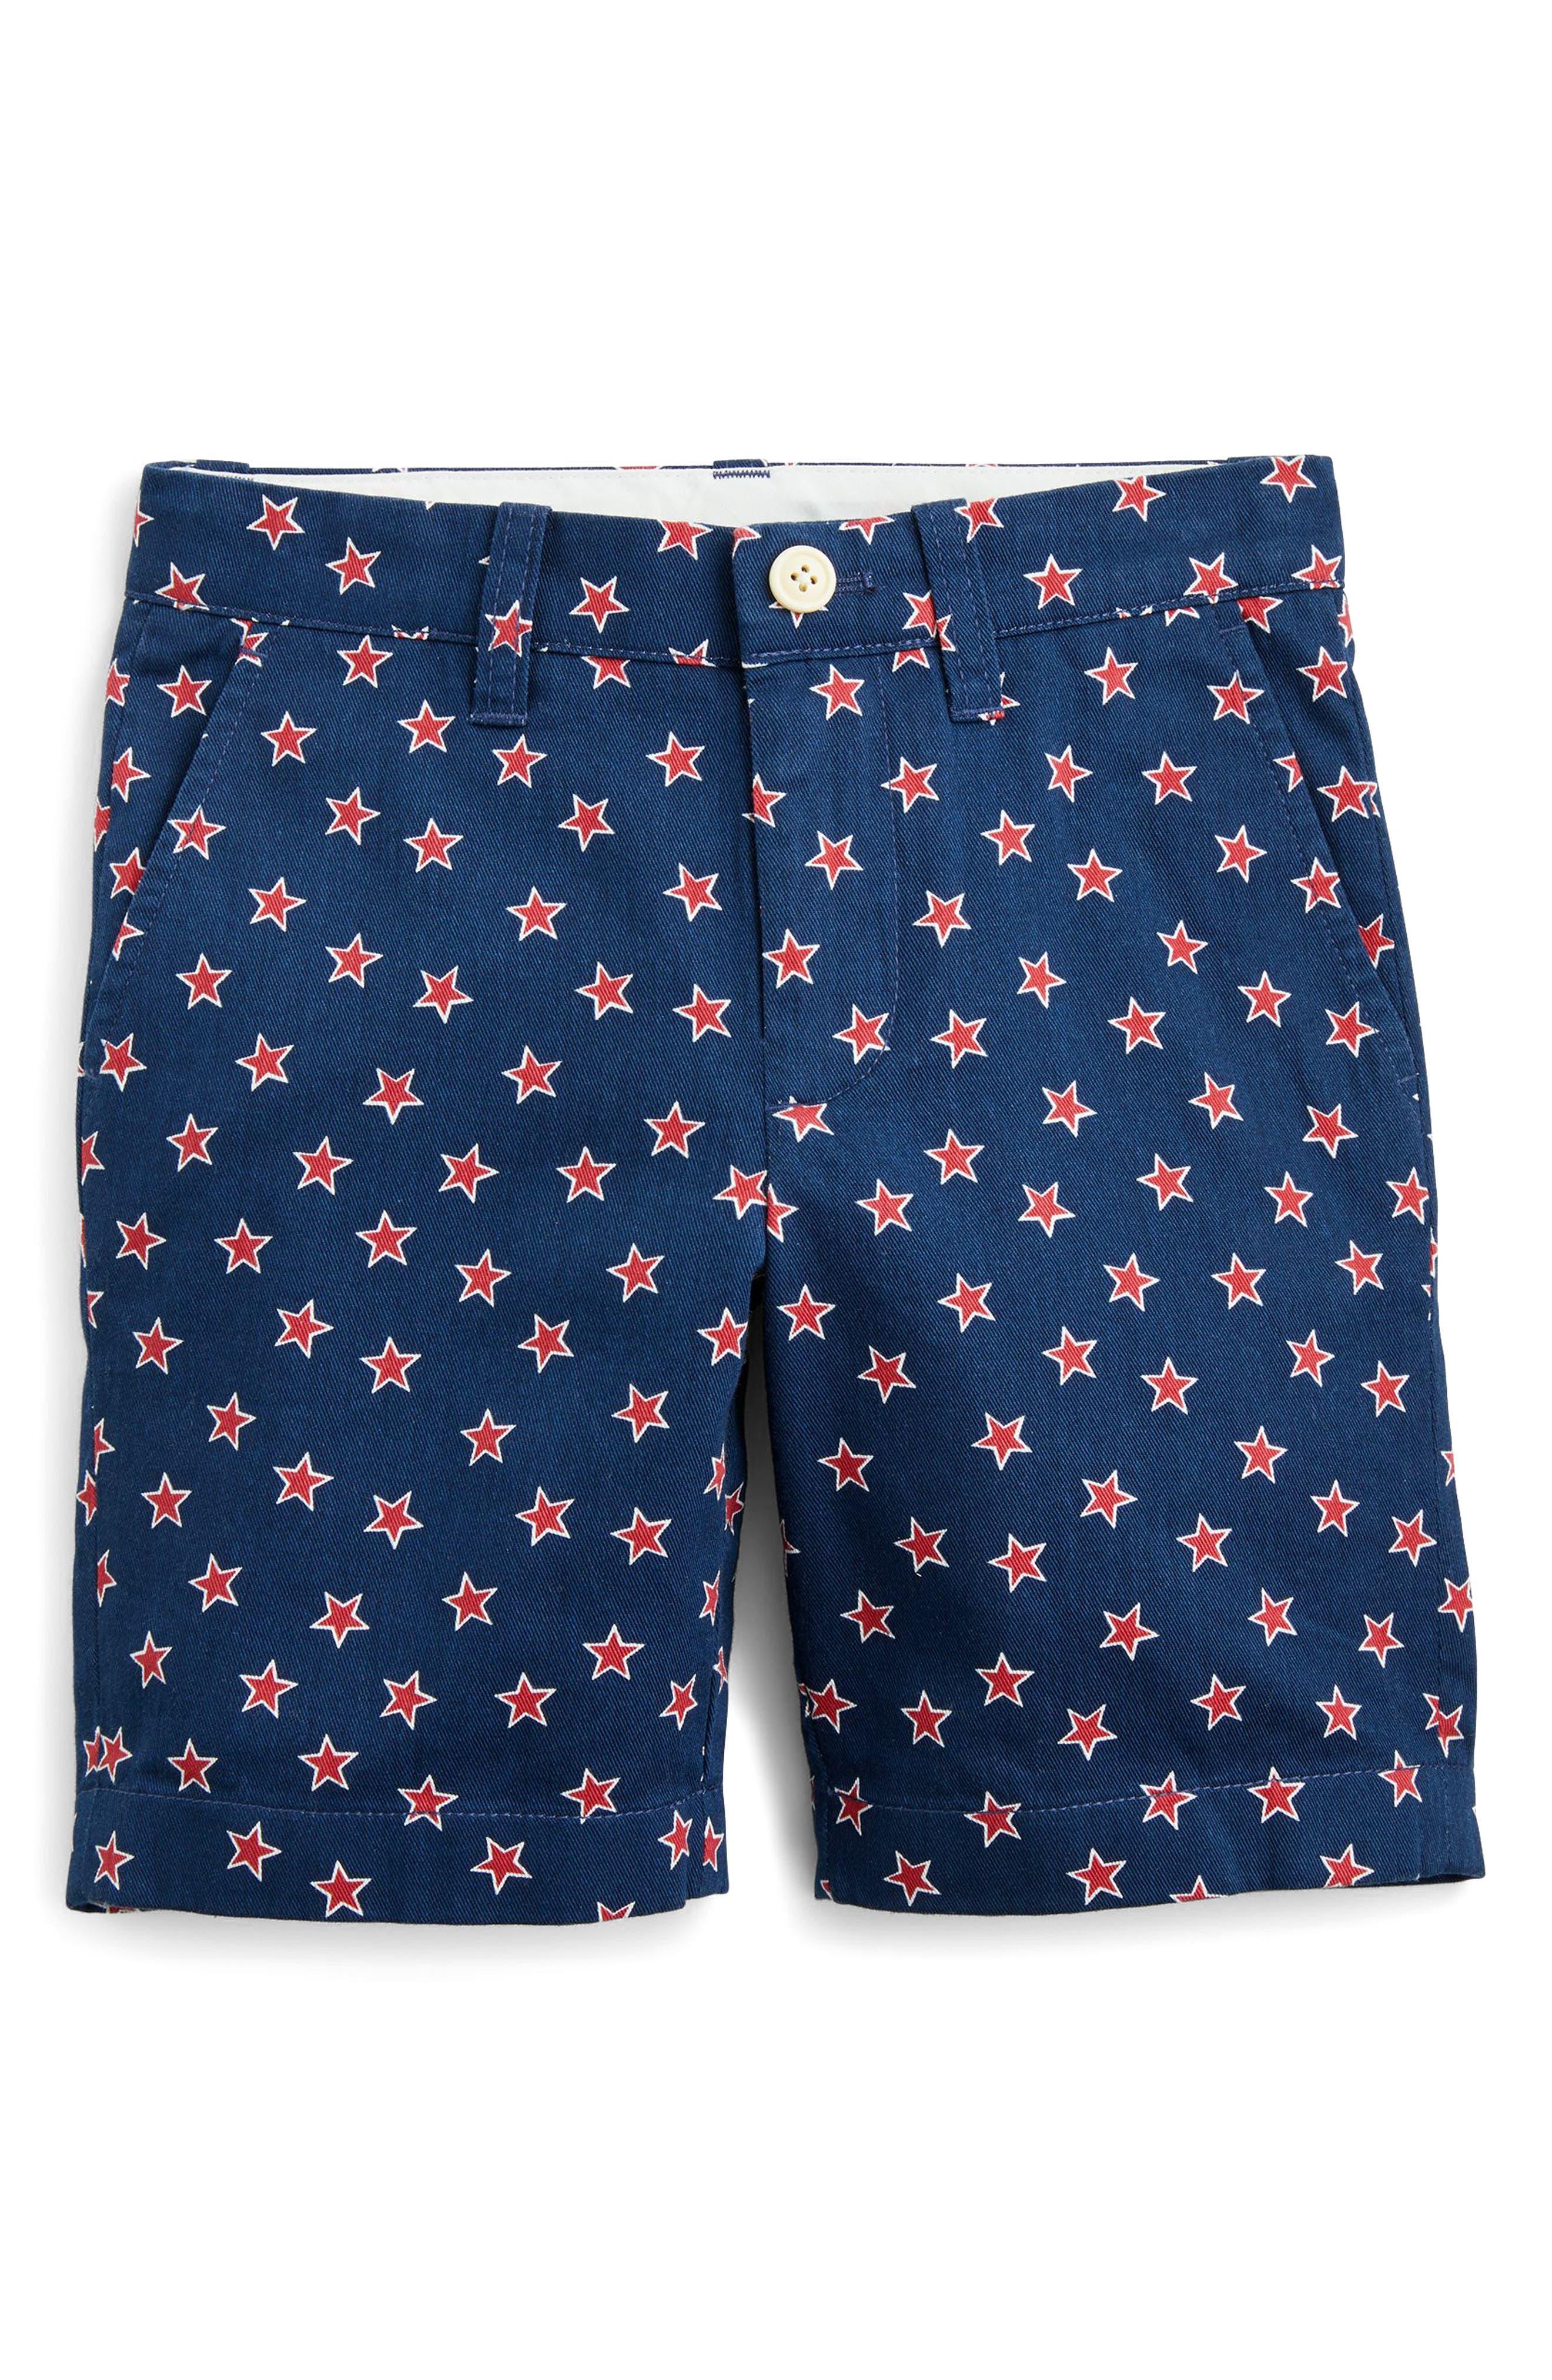 crewcuts by J.Crew Stanton Critter Stars Shorts (Toddler Boys, Little Boys & Big Boys)